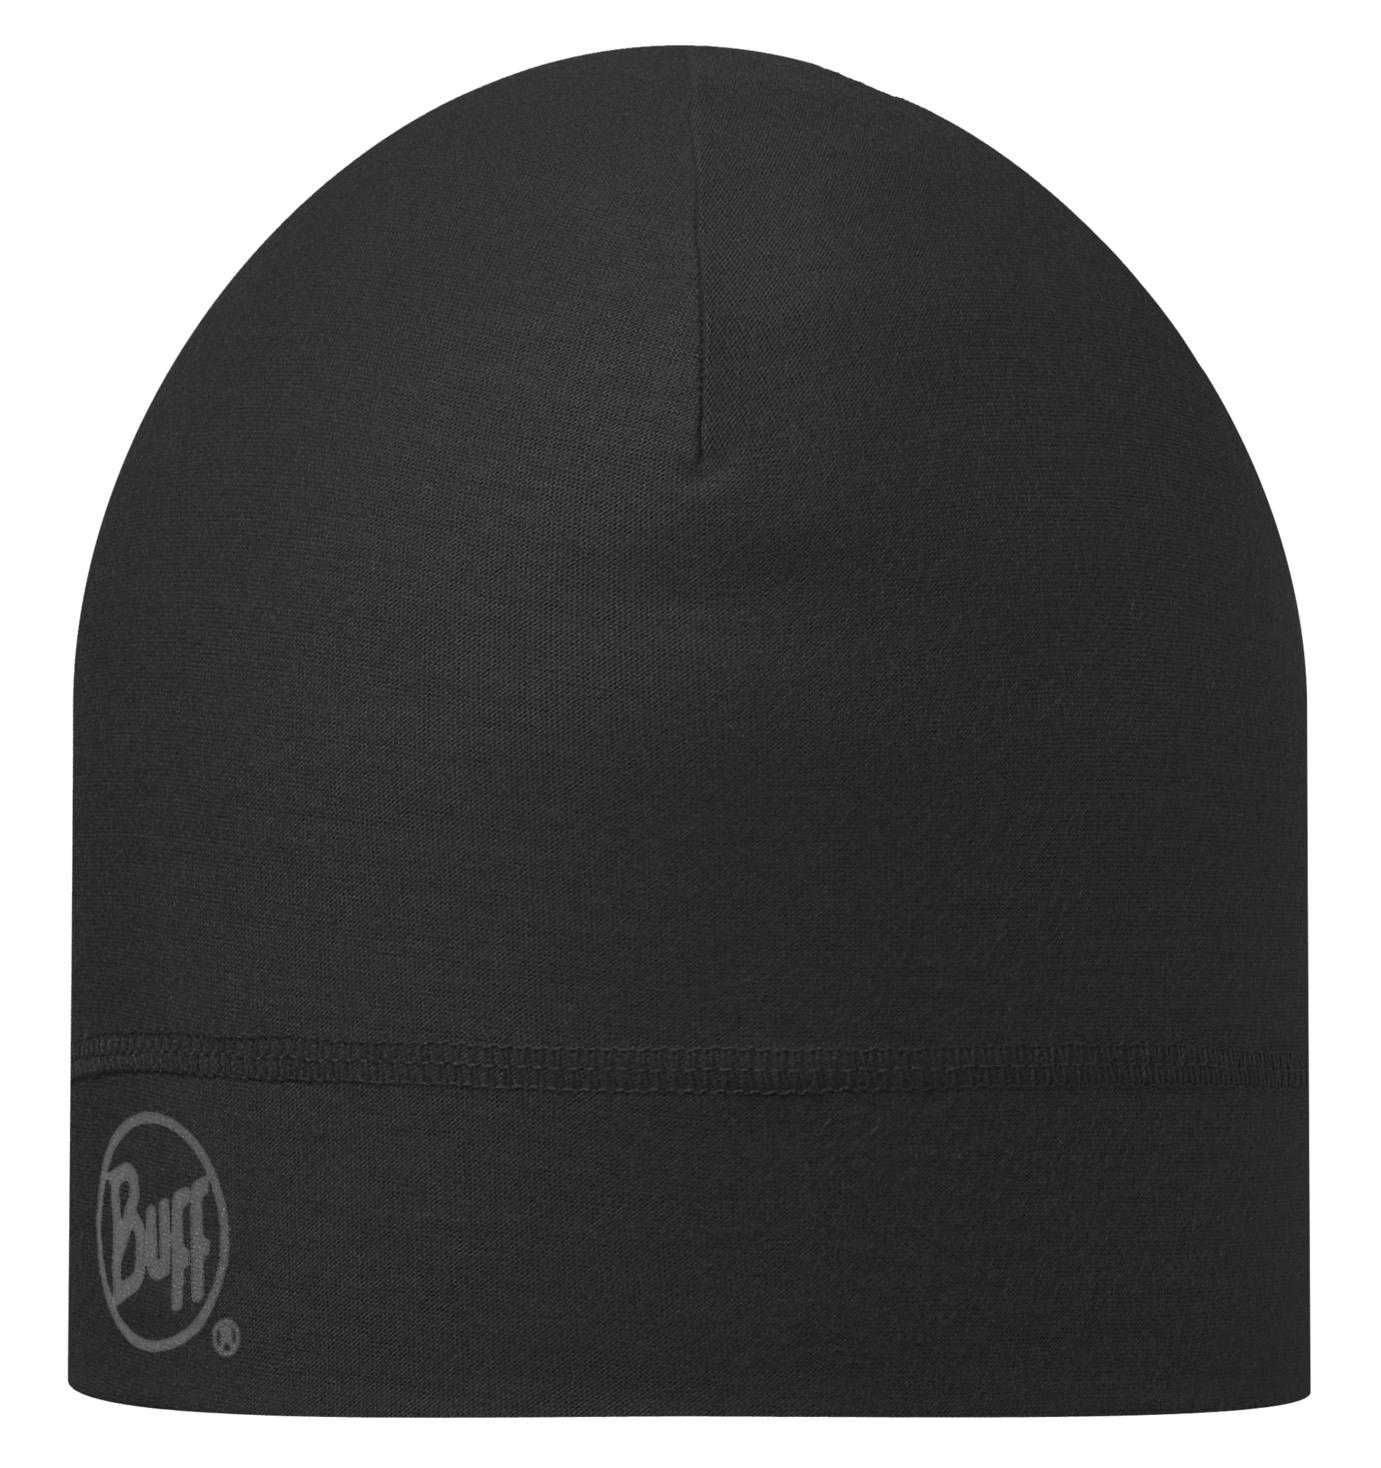 Купить Шапка BUFF Coolmax COOLMAX 1 LAYER HAT SOLID BLACK Банданы и шарфы Buff ® 1185649